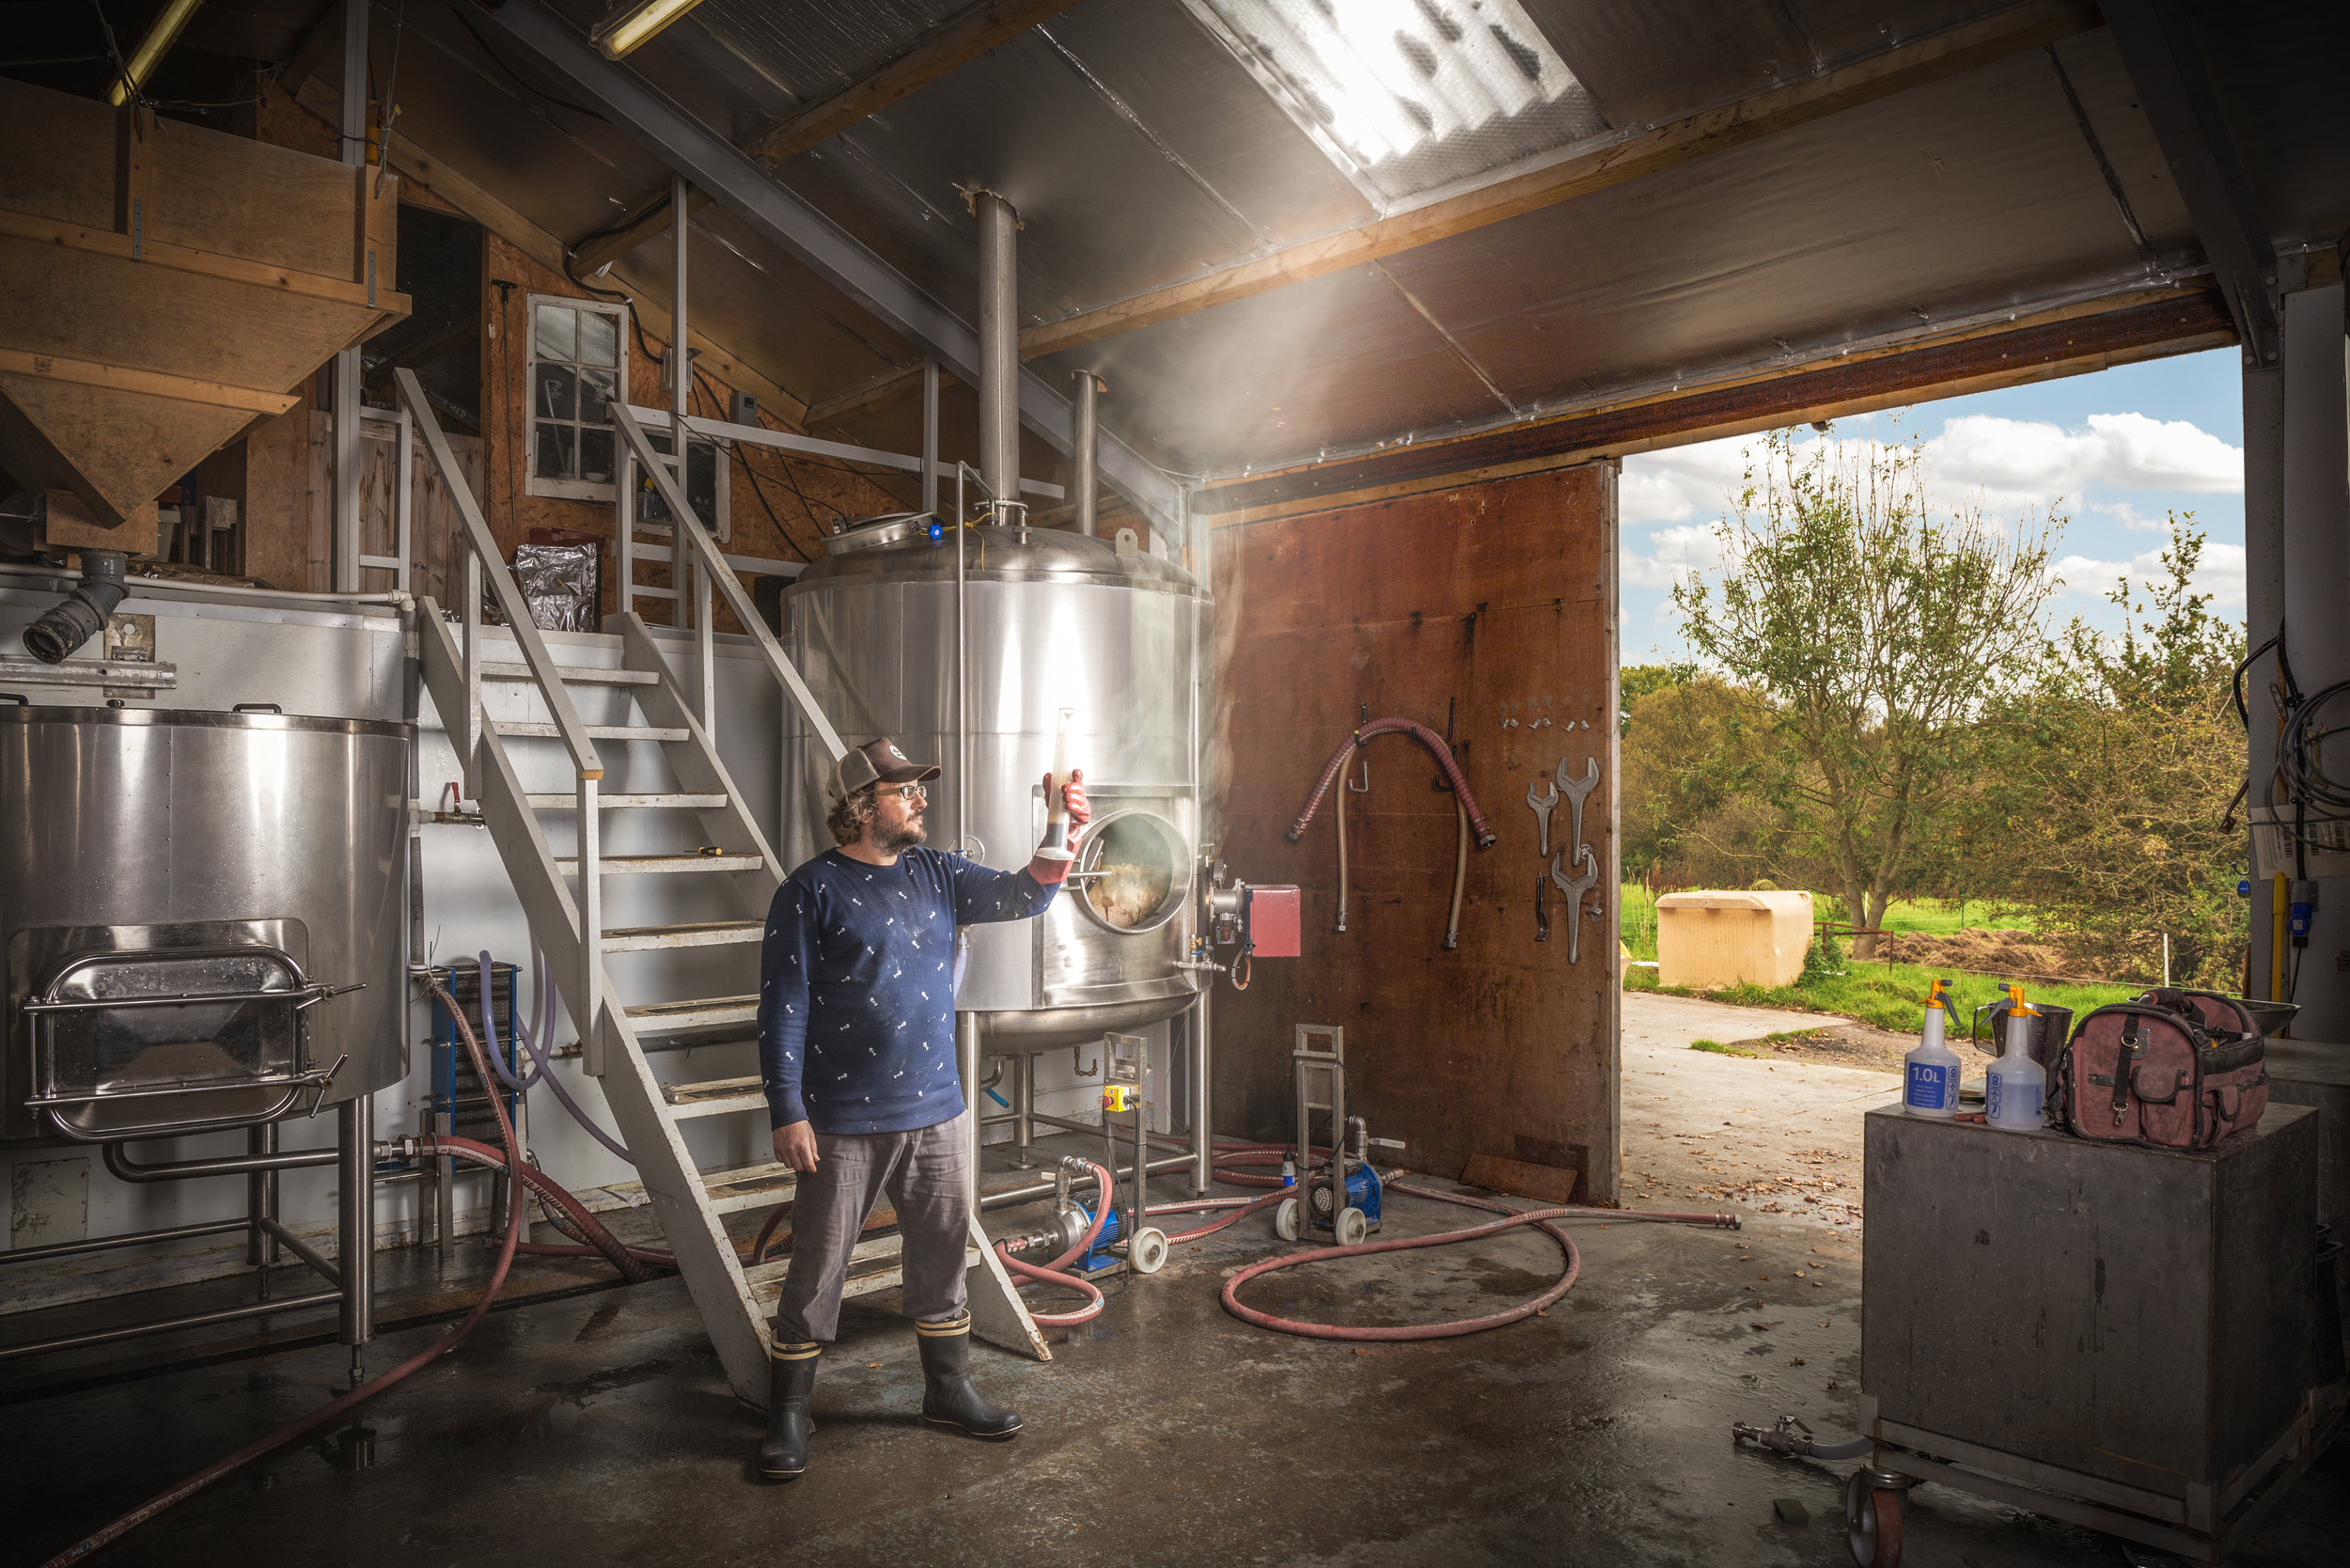 Gun Brewery by Chris Brock